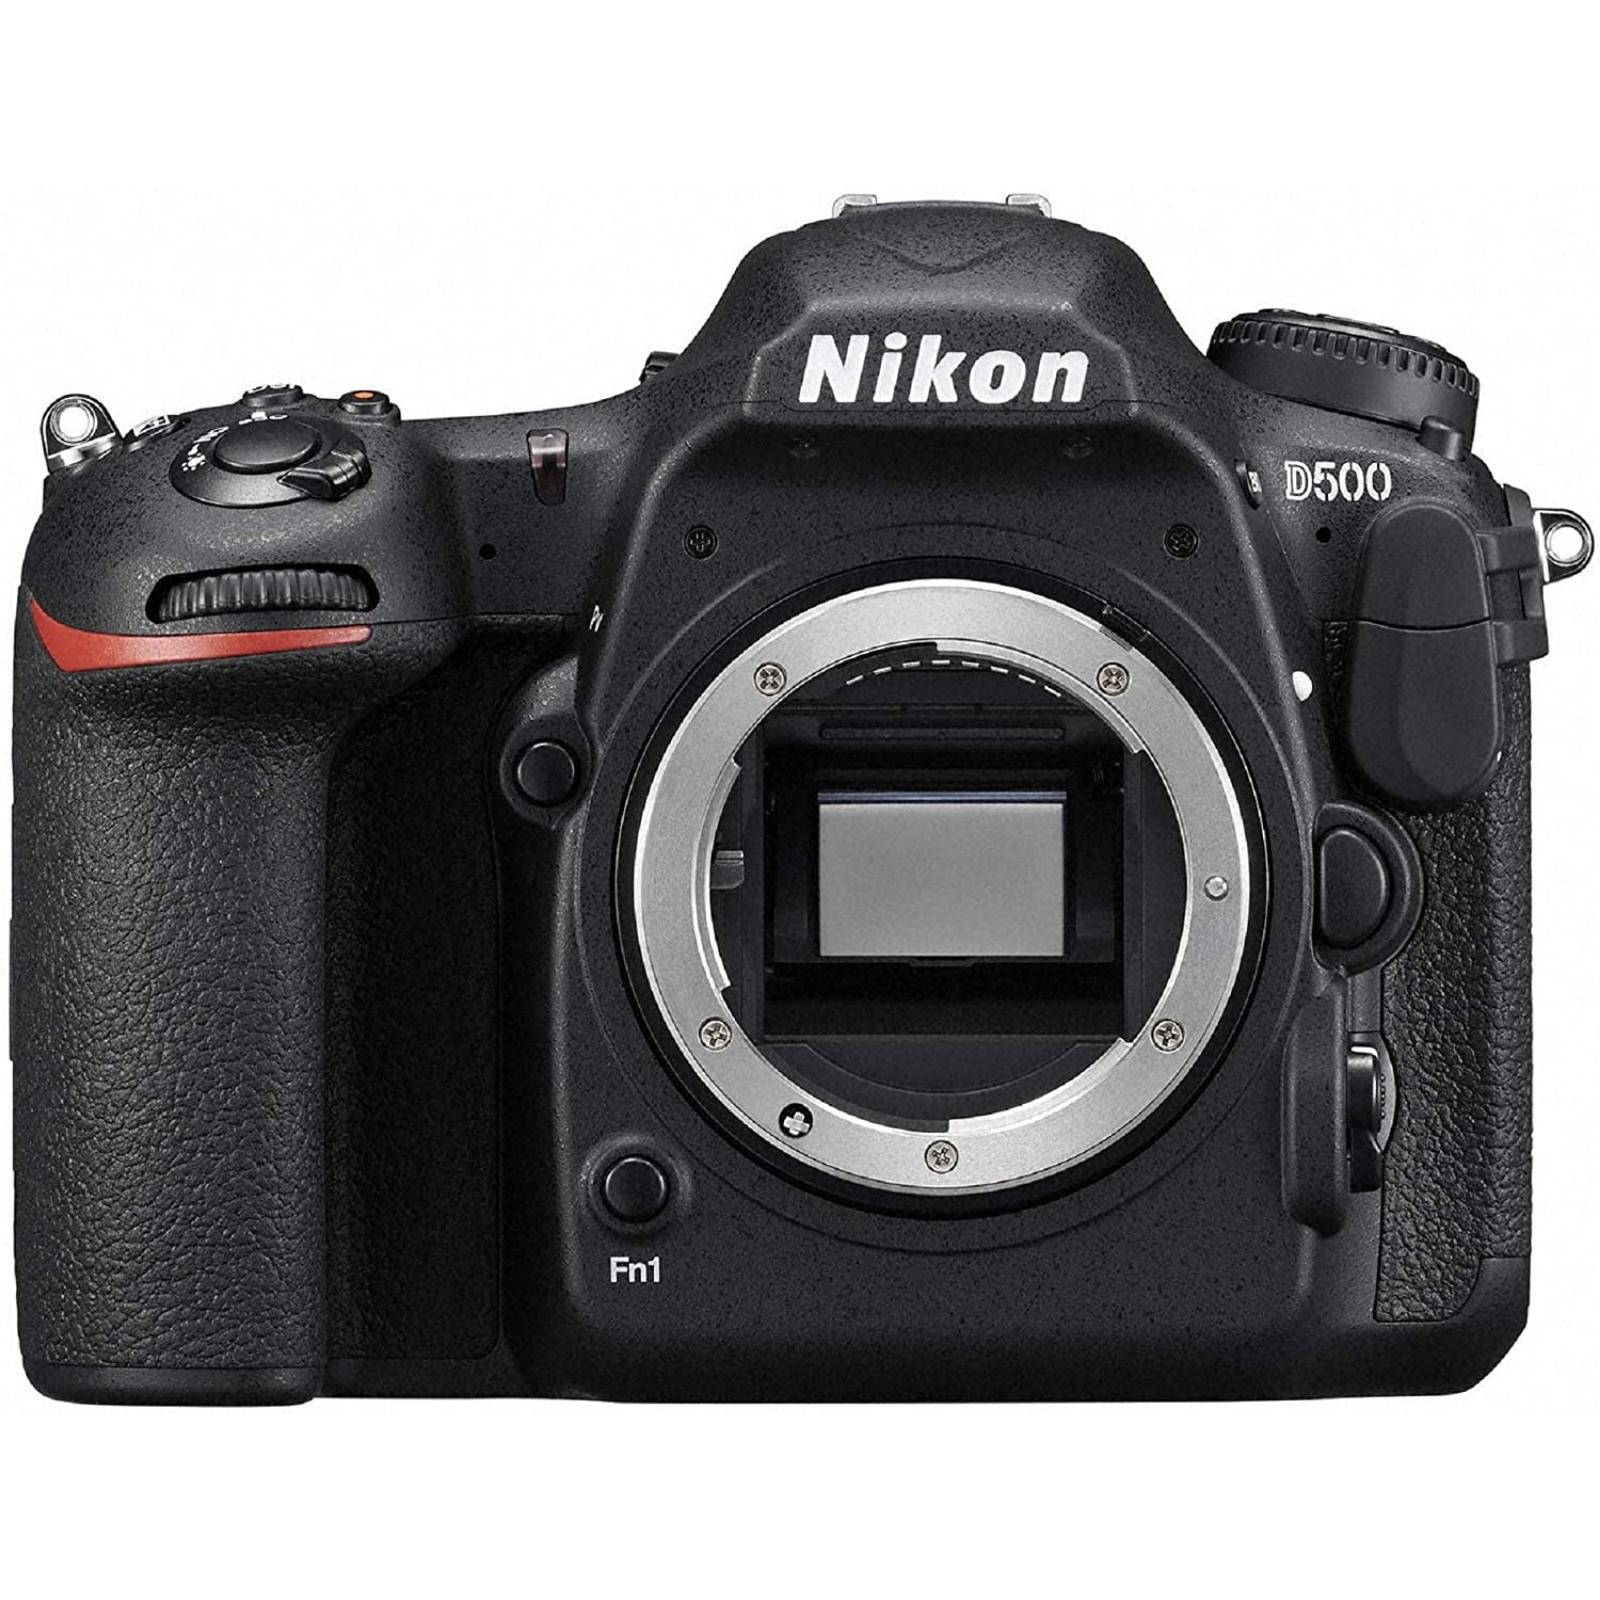 Nikon ニコン デジタル一眼レフカメラ D500 ボディー ブラック 新品